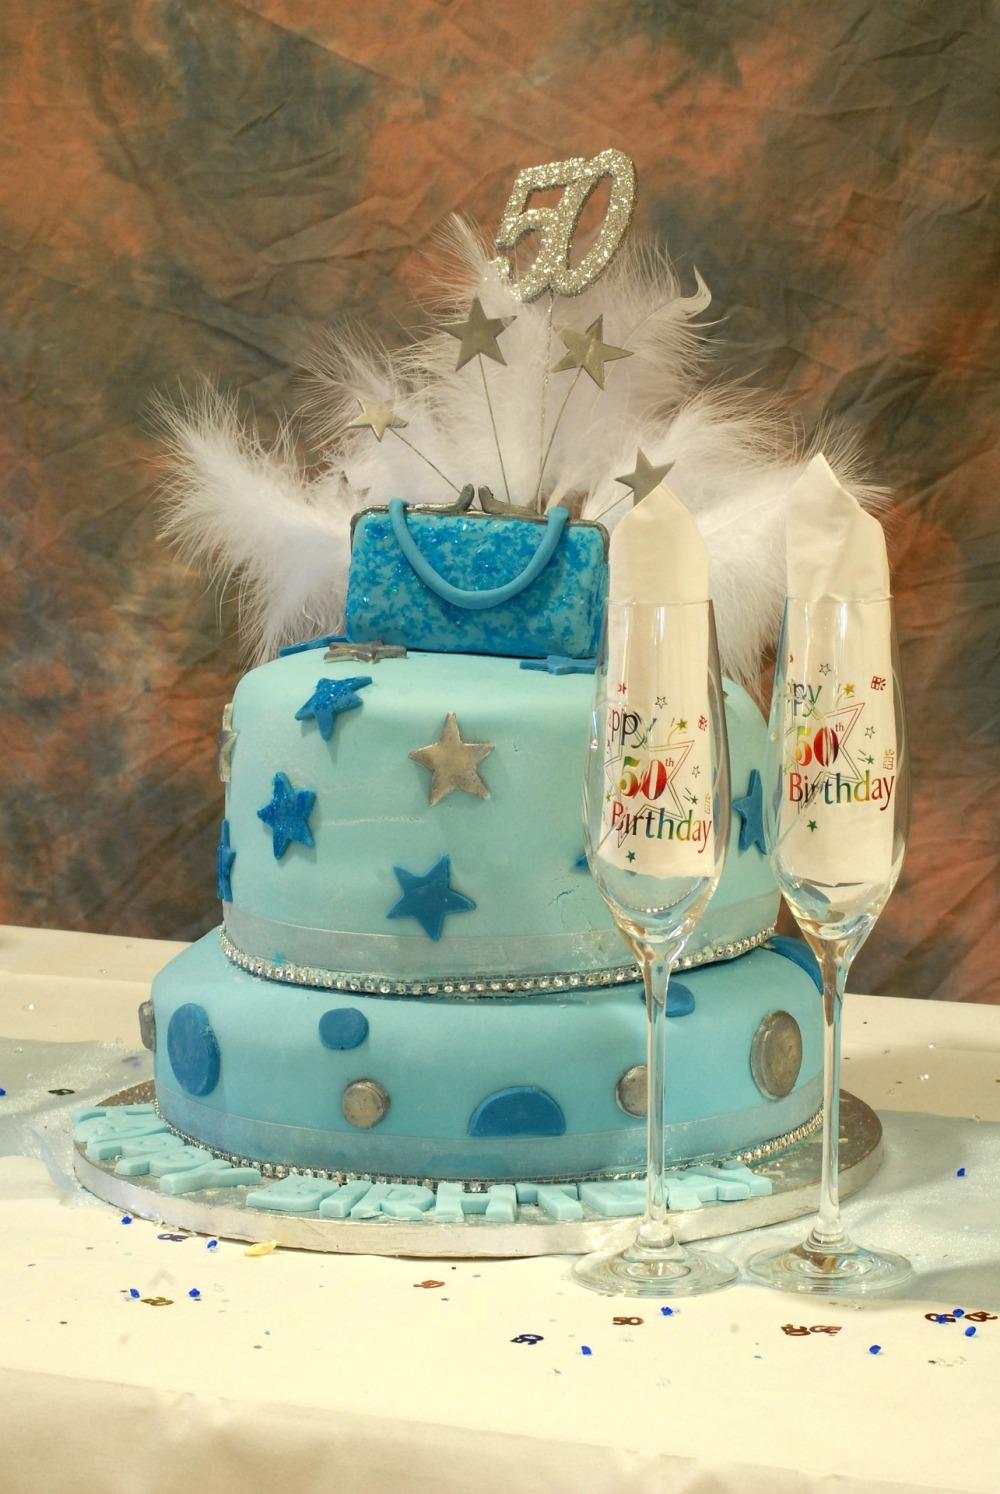 cake-1940739_1920.jpg